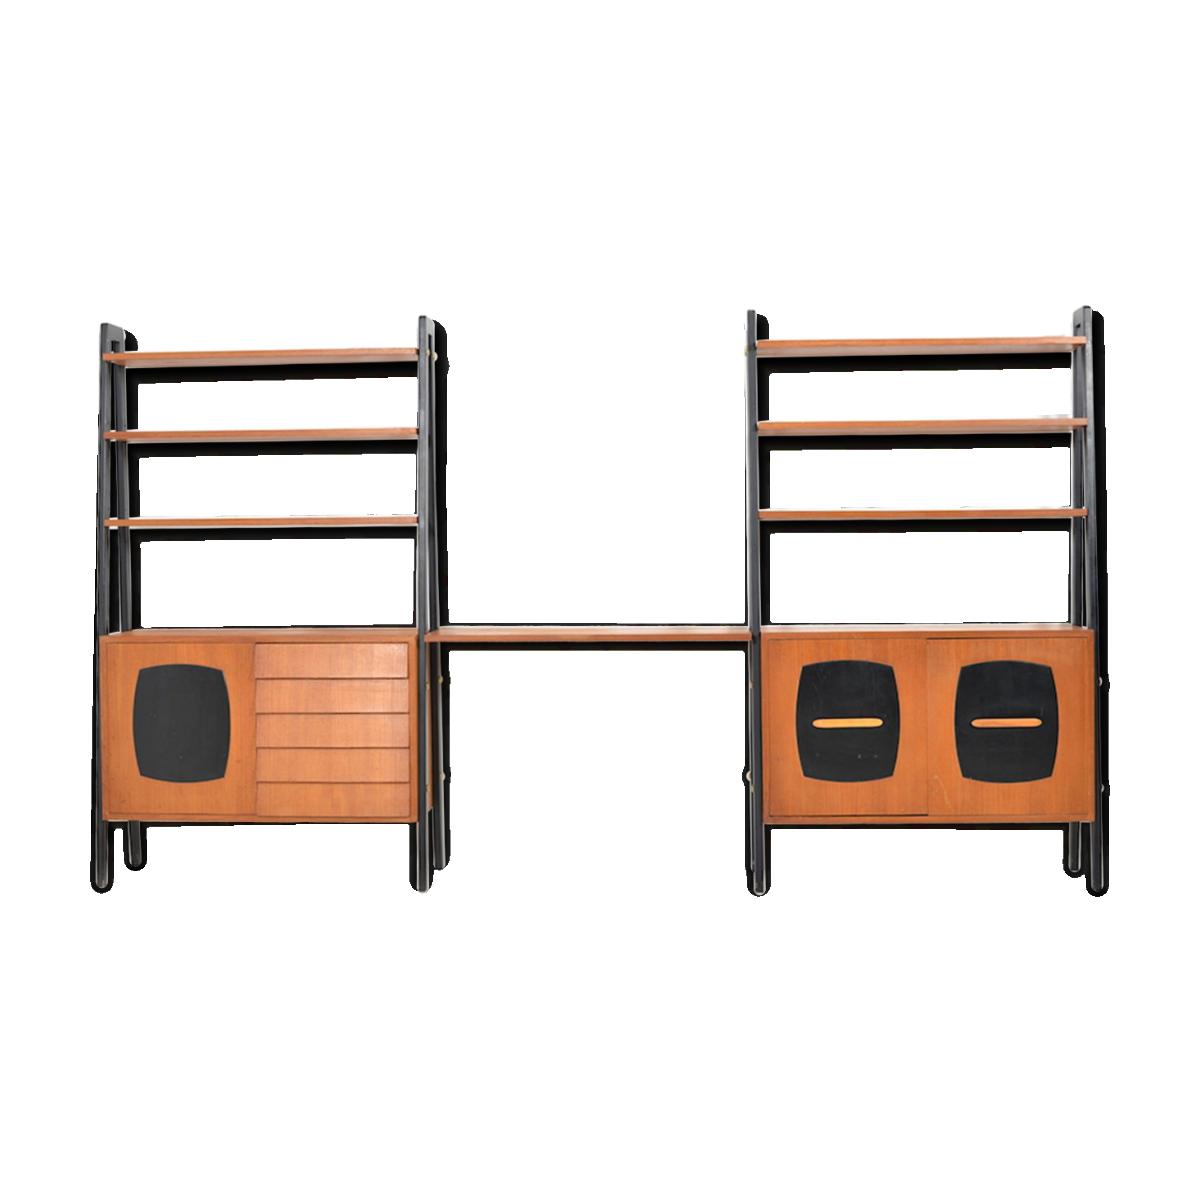 Hottest Auction Item? Vintage IKEA Furniture